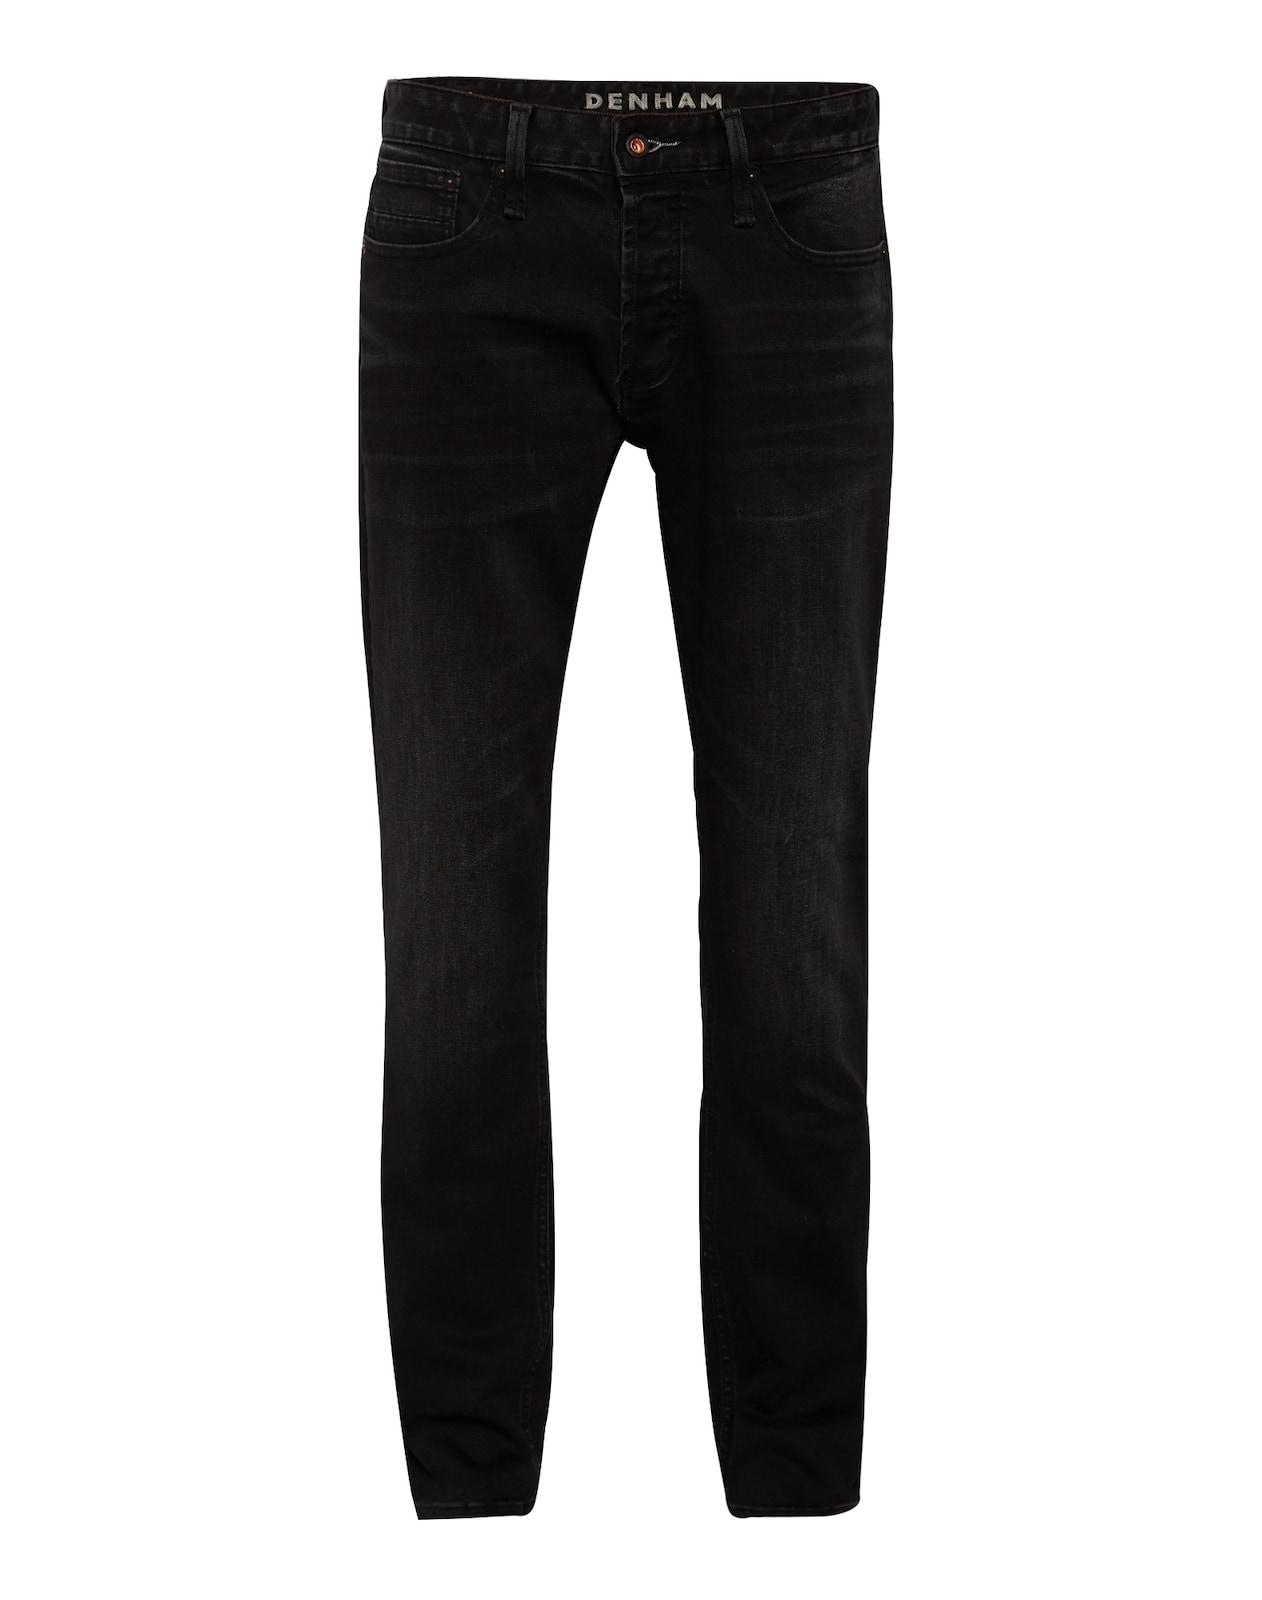 DENHAM Jeans ´Razor´